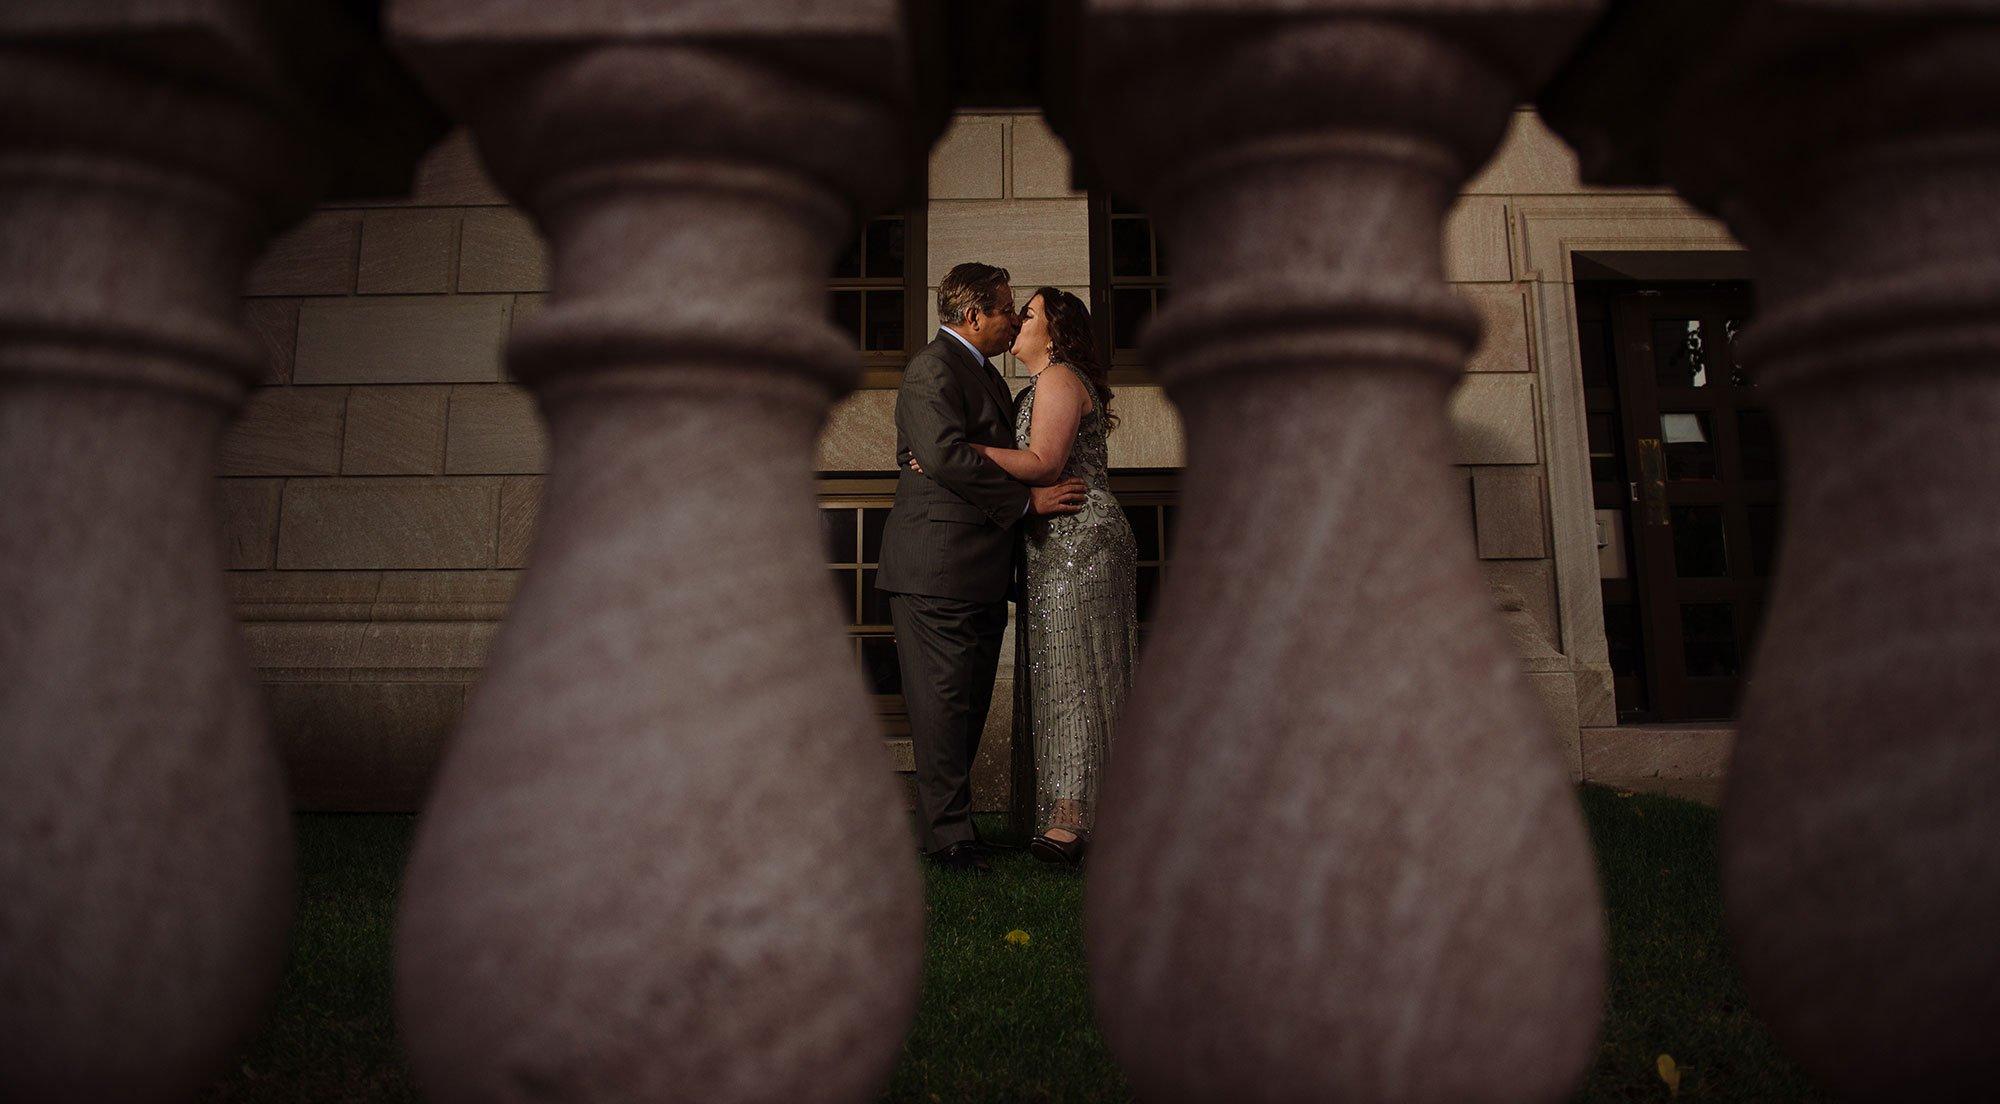 couple in rice park for wedding photos between pillars